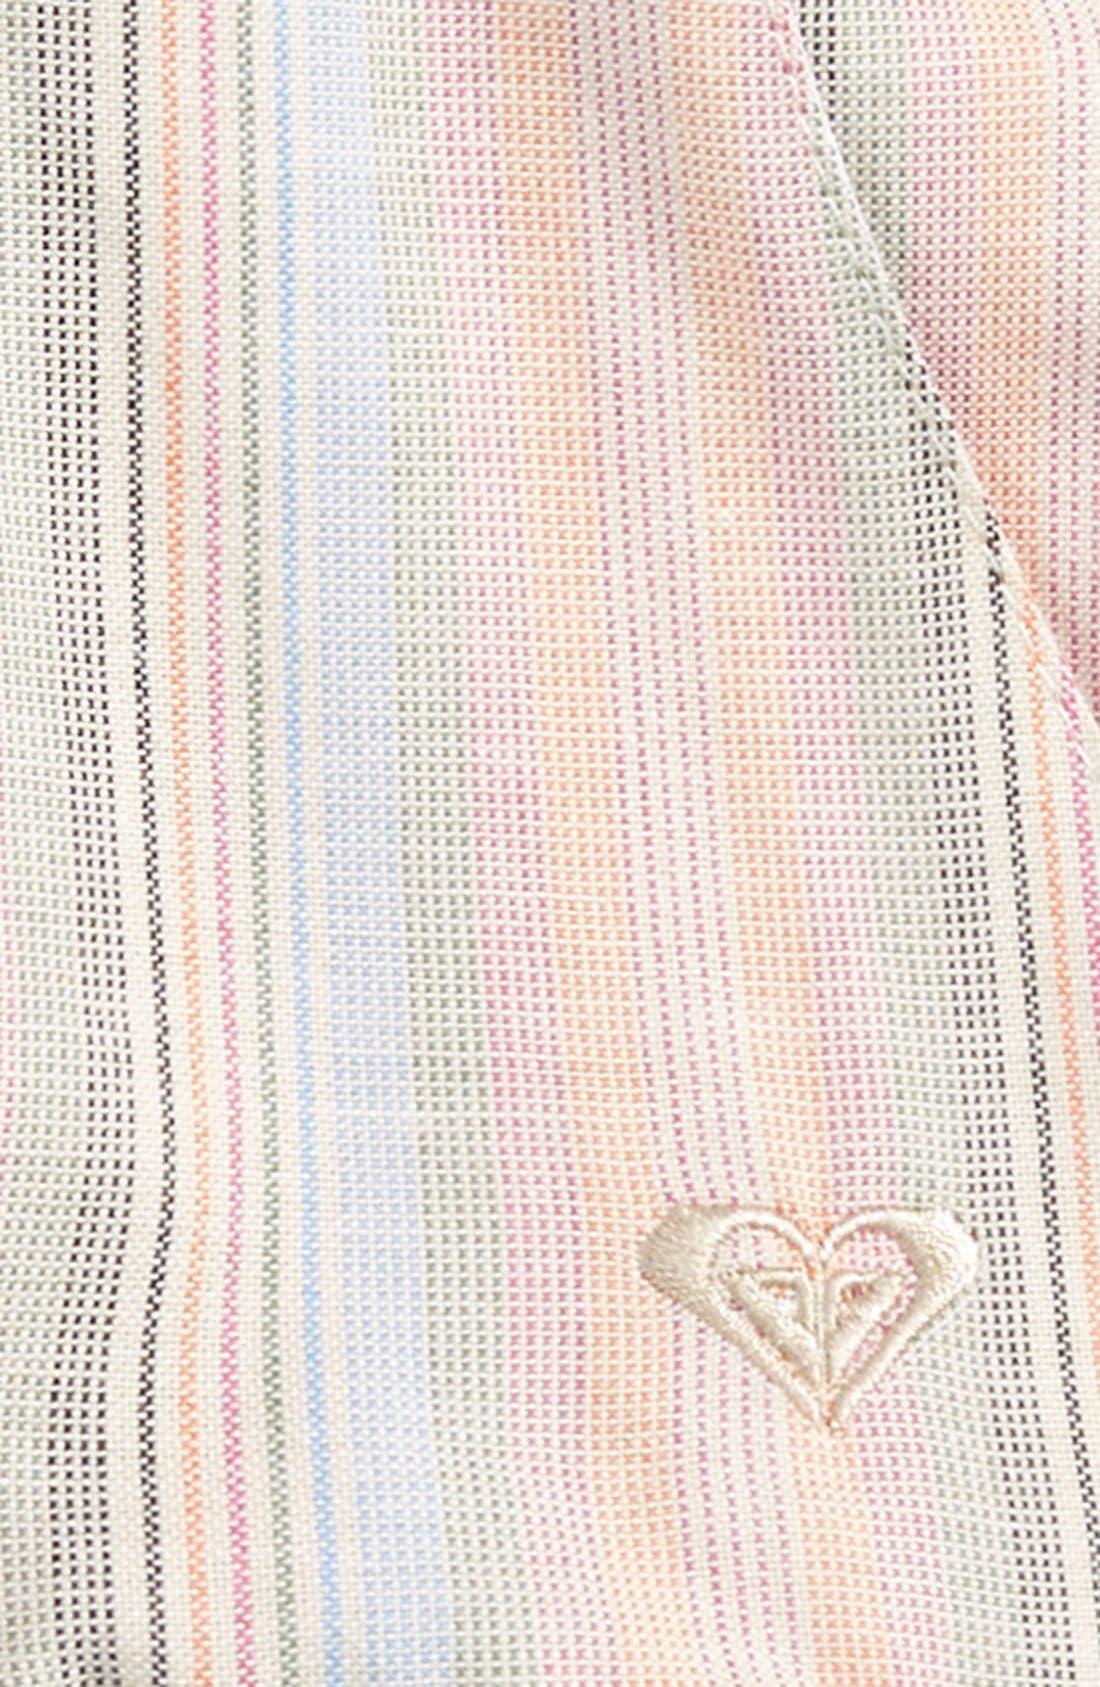 Alternate Image 2  - Roxy 'Ruffled Feathers' Stripe Shorts (Baby Girls)